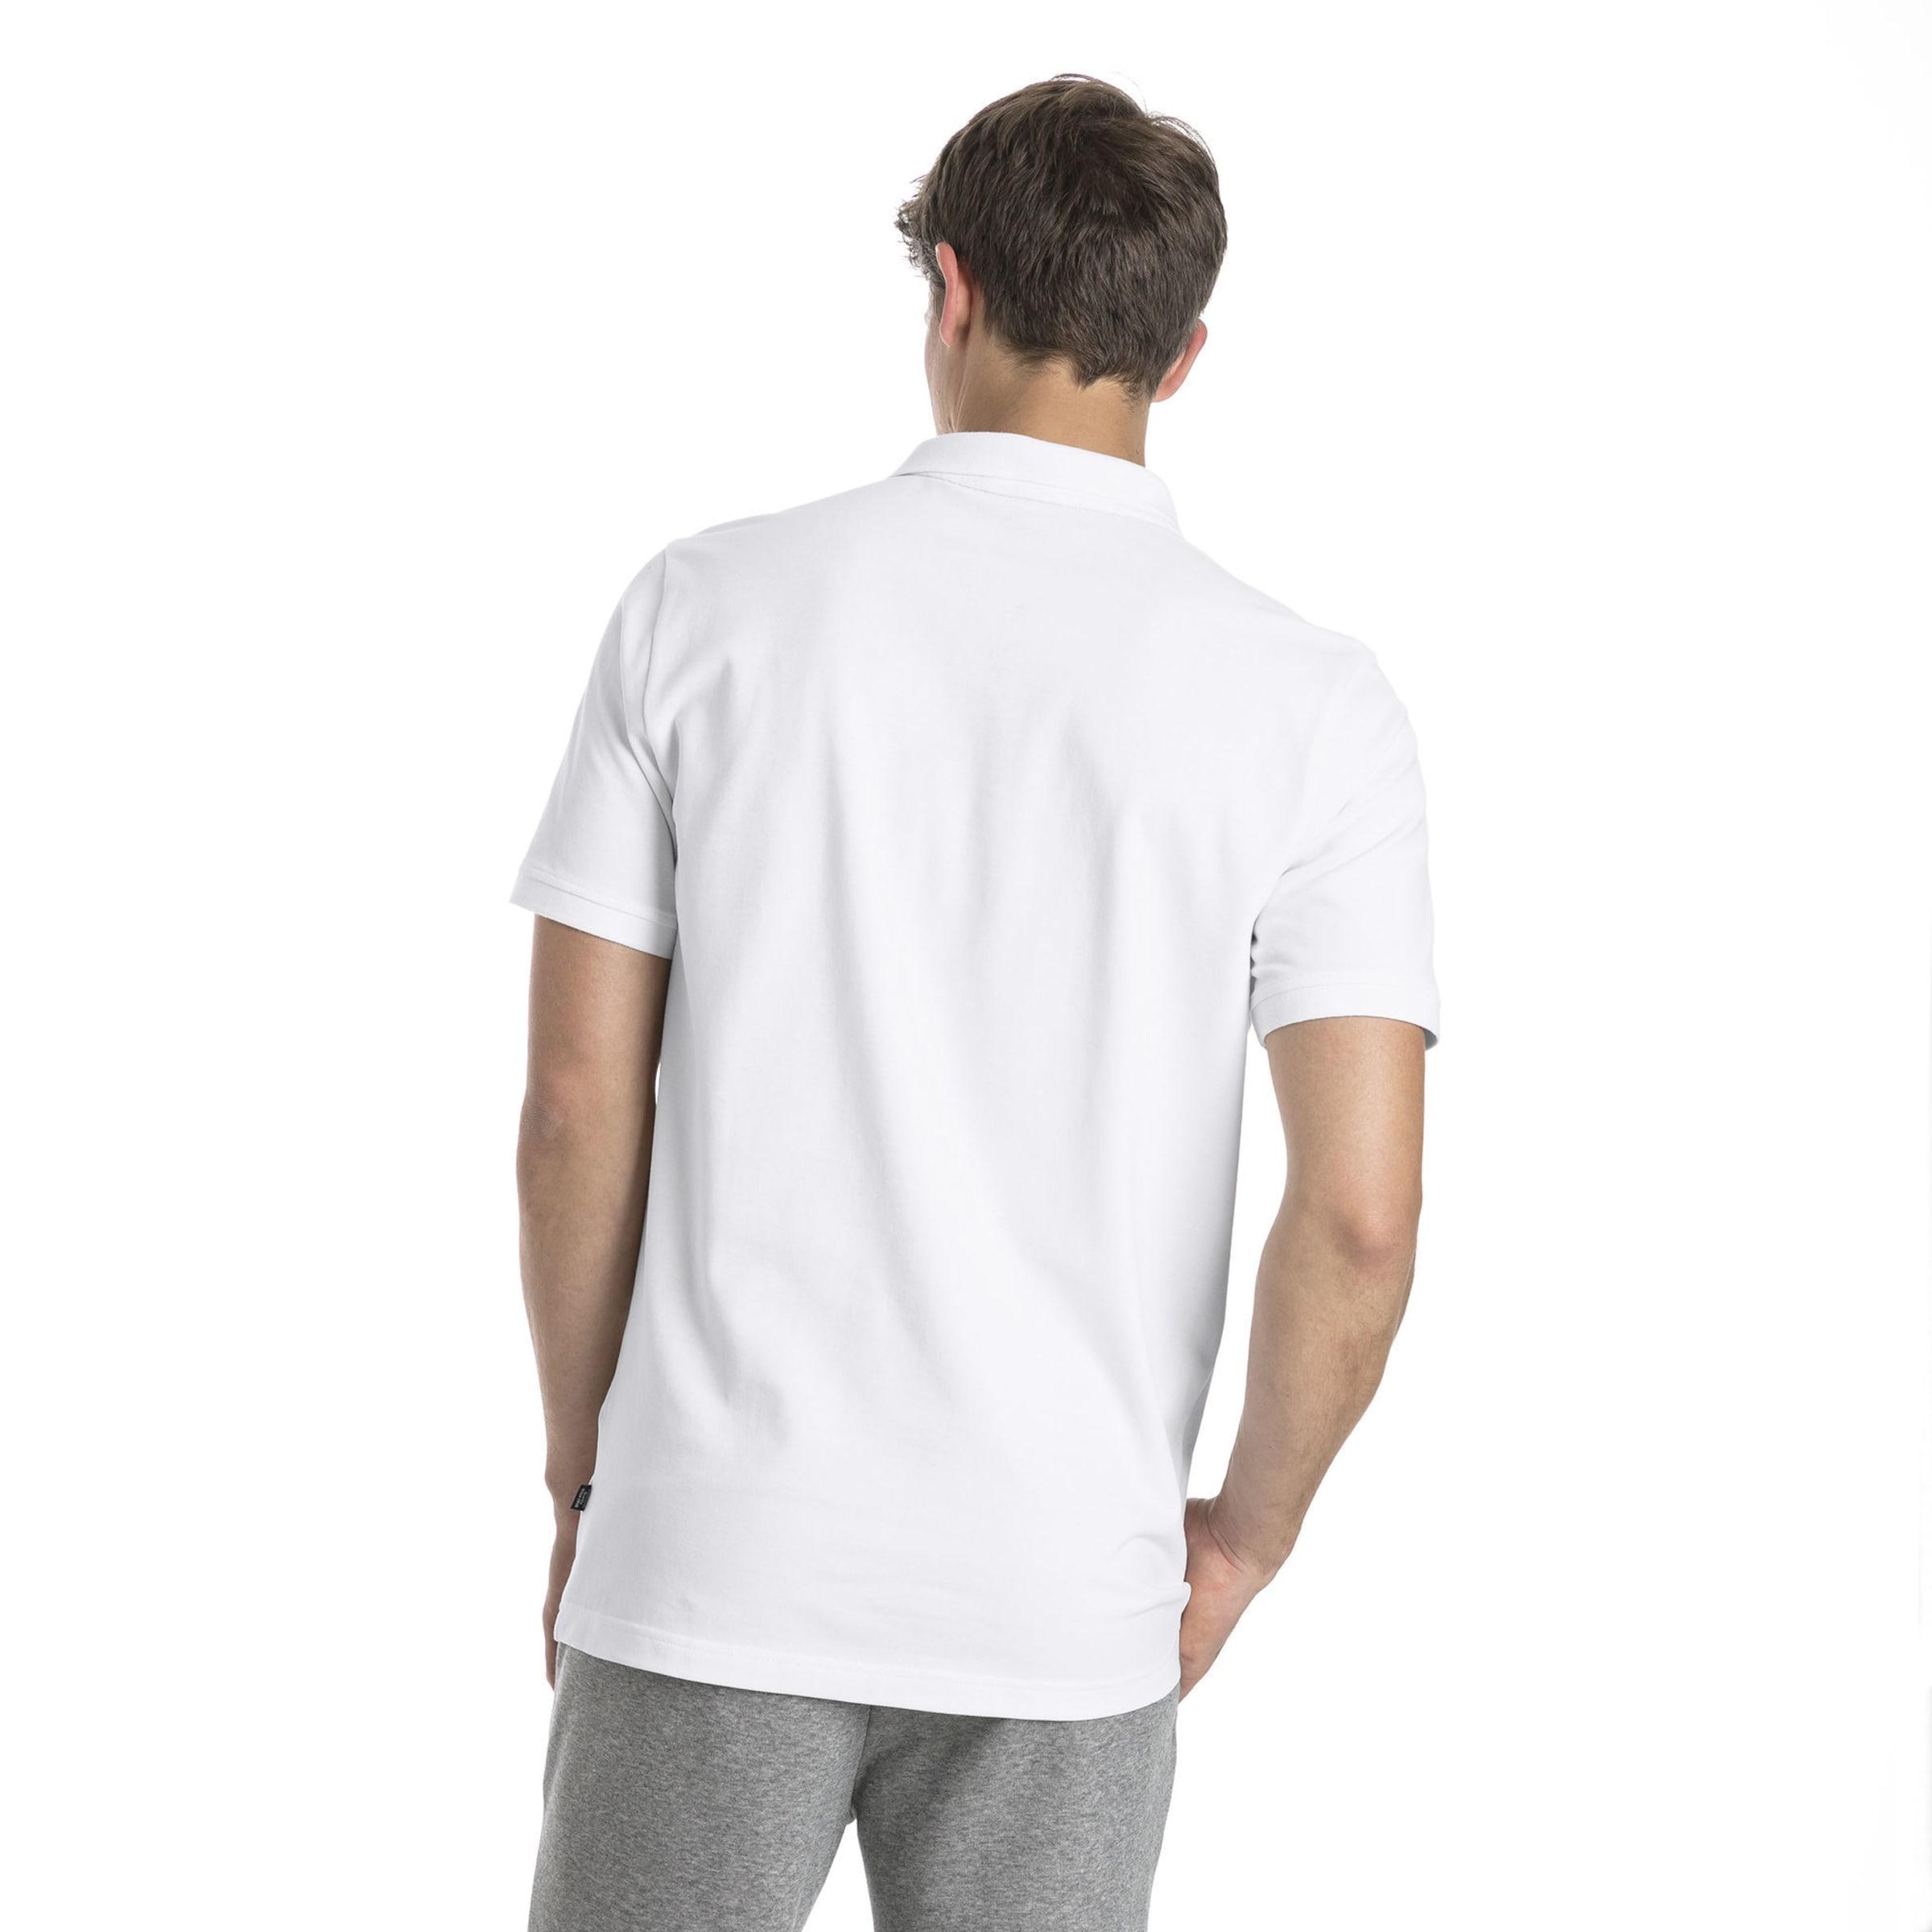 Nuit shirt T Bleu 'essentials' Puma En N8Zn0kwOPX